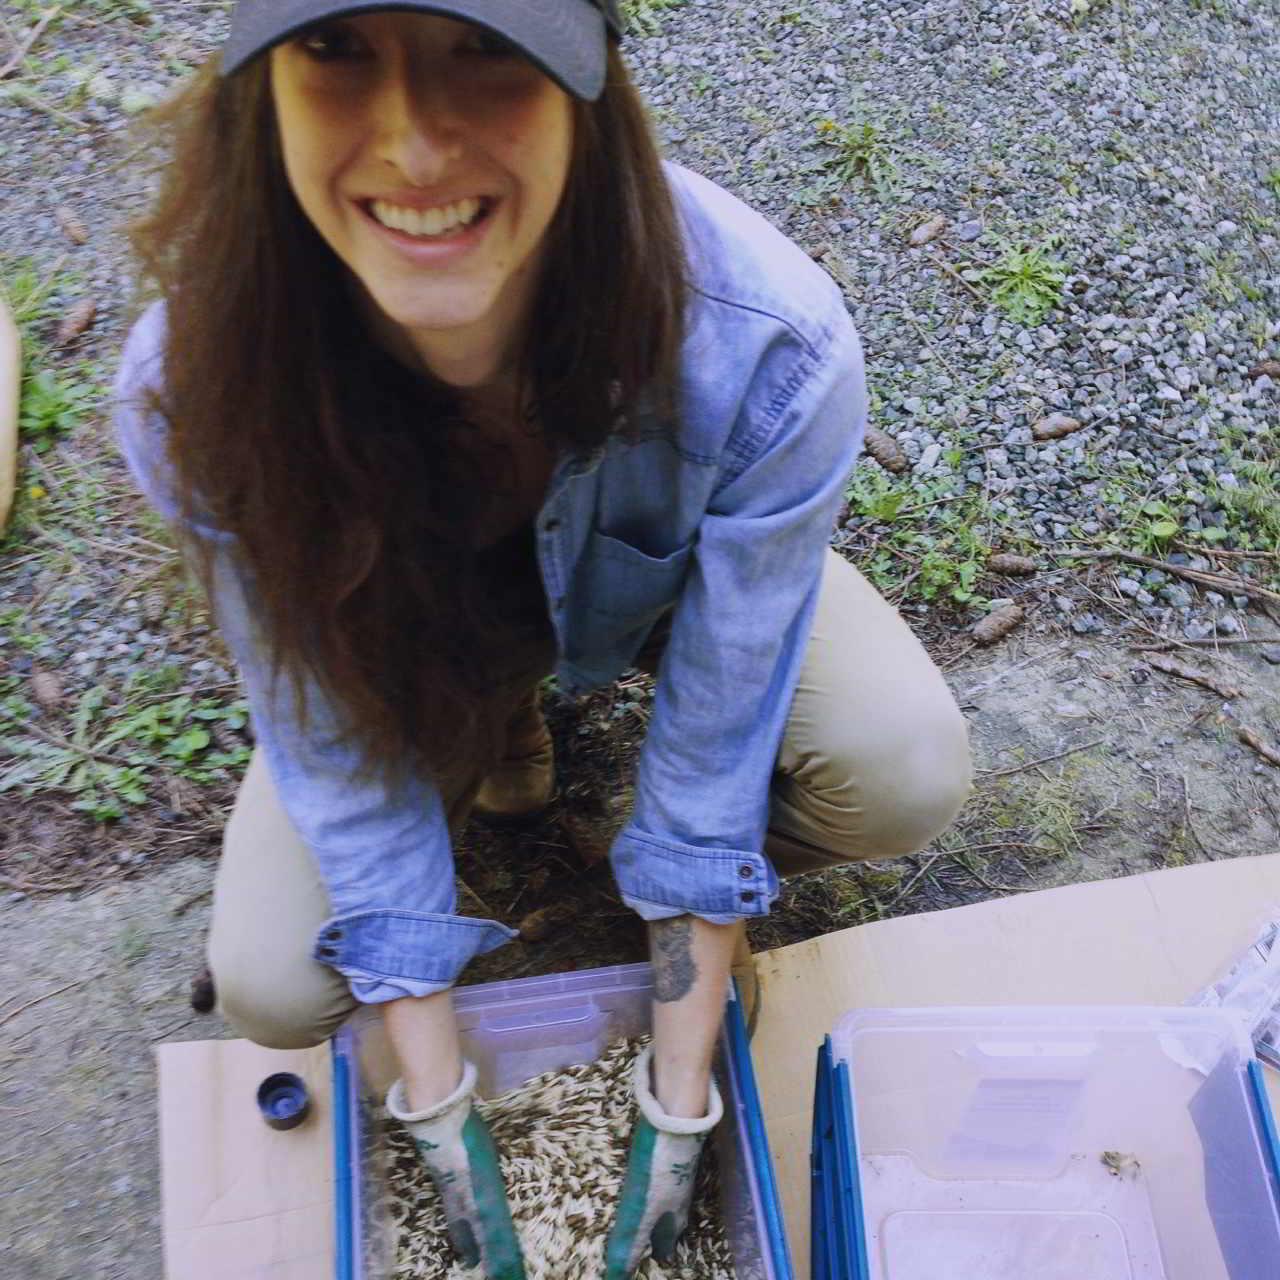 Twin Island Cider Katie Selbee